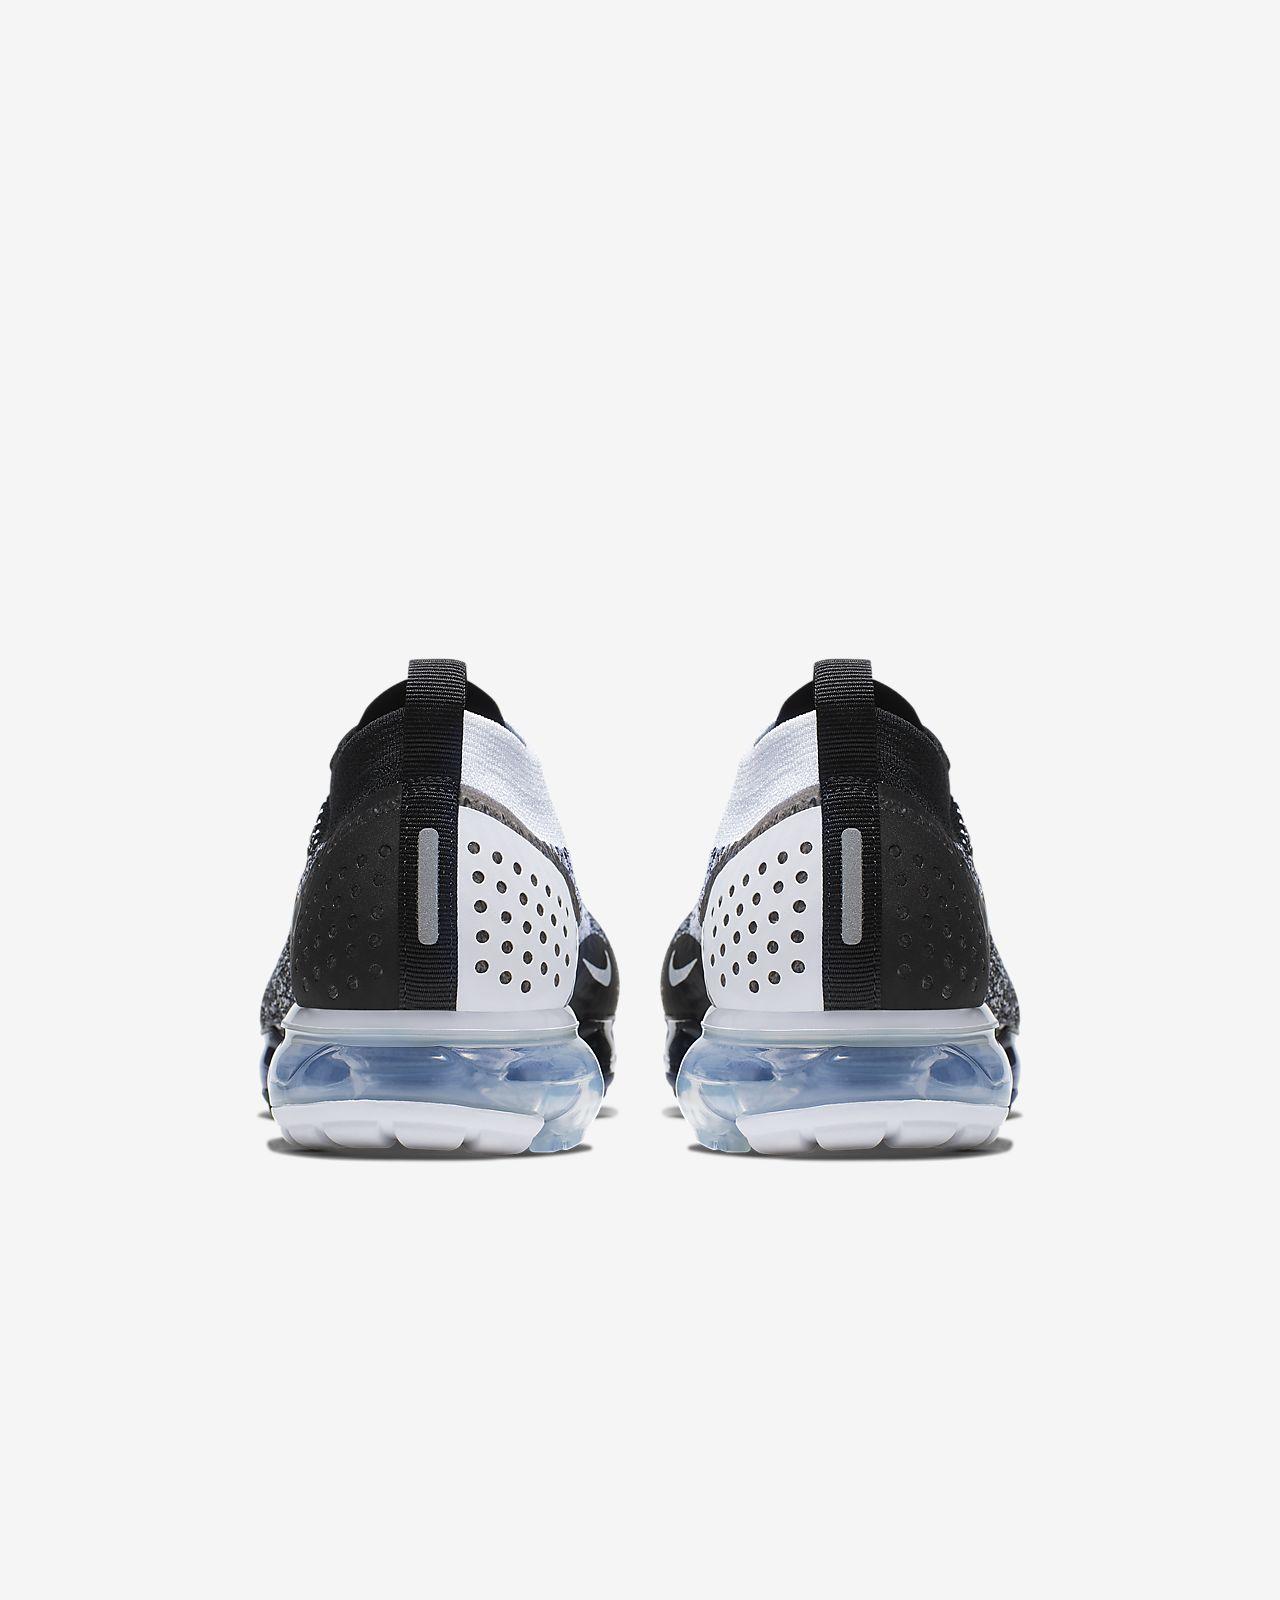 promo code 2d54f e9a39 ... Nike Air VaporMax Flyknit 2 Shoe